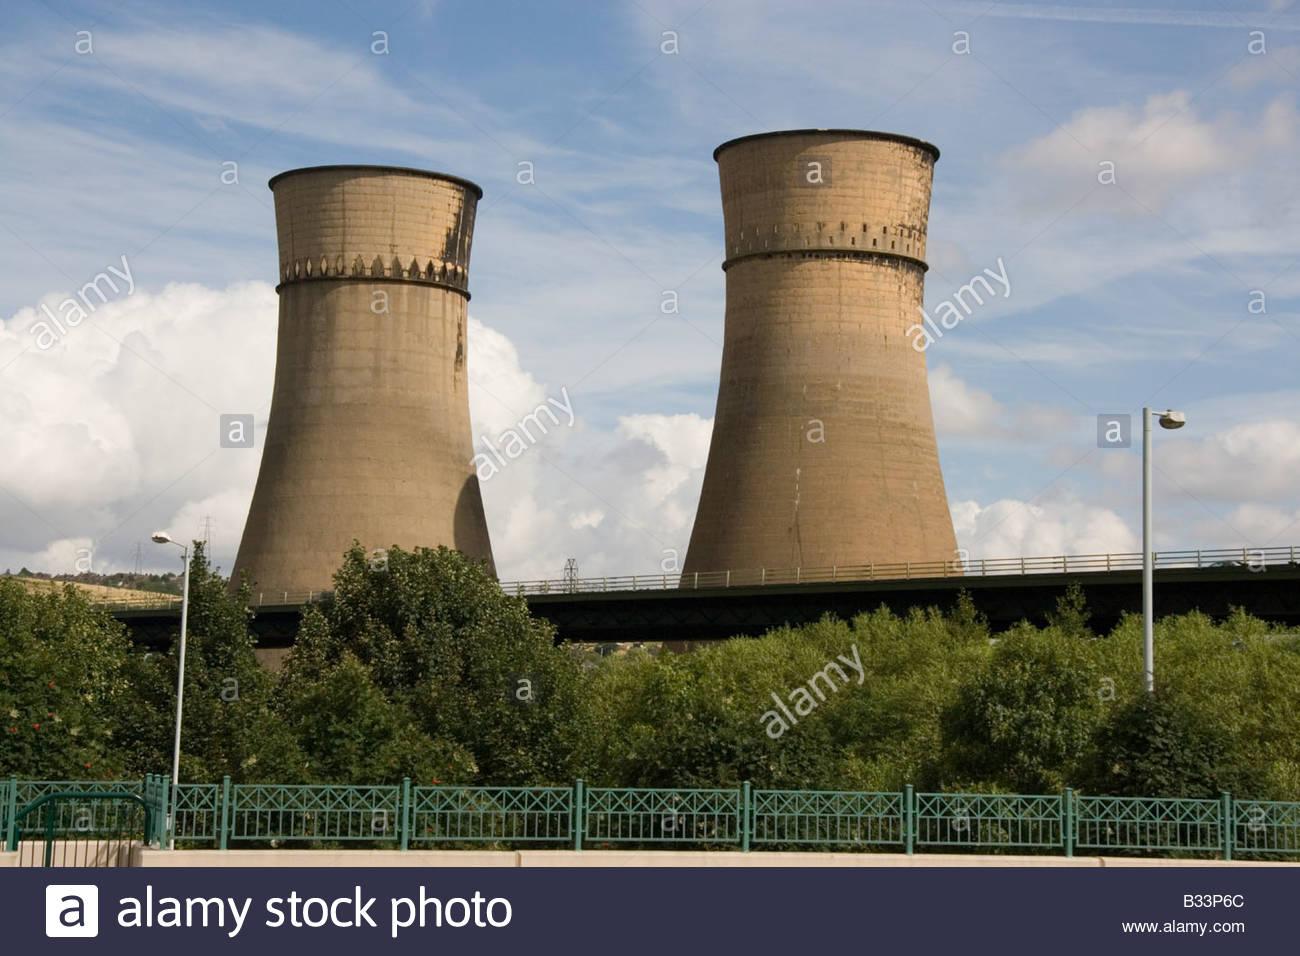 Tinsley Towers Sheffield England - Stock Image